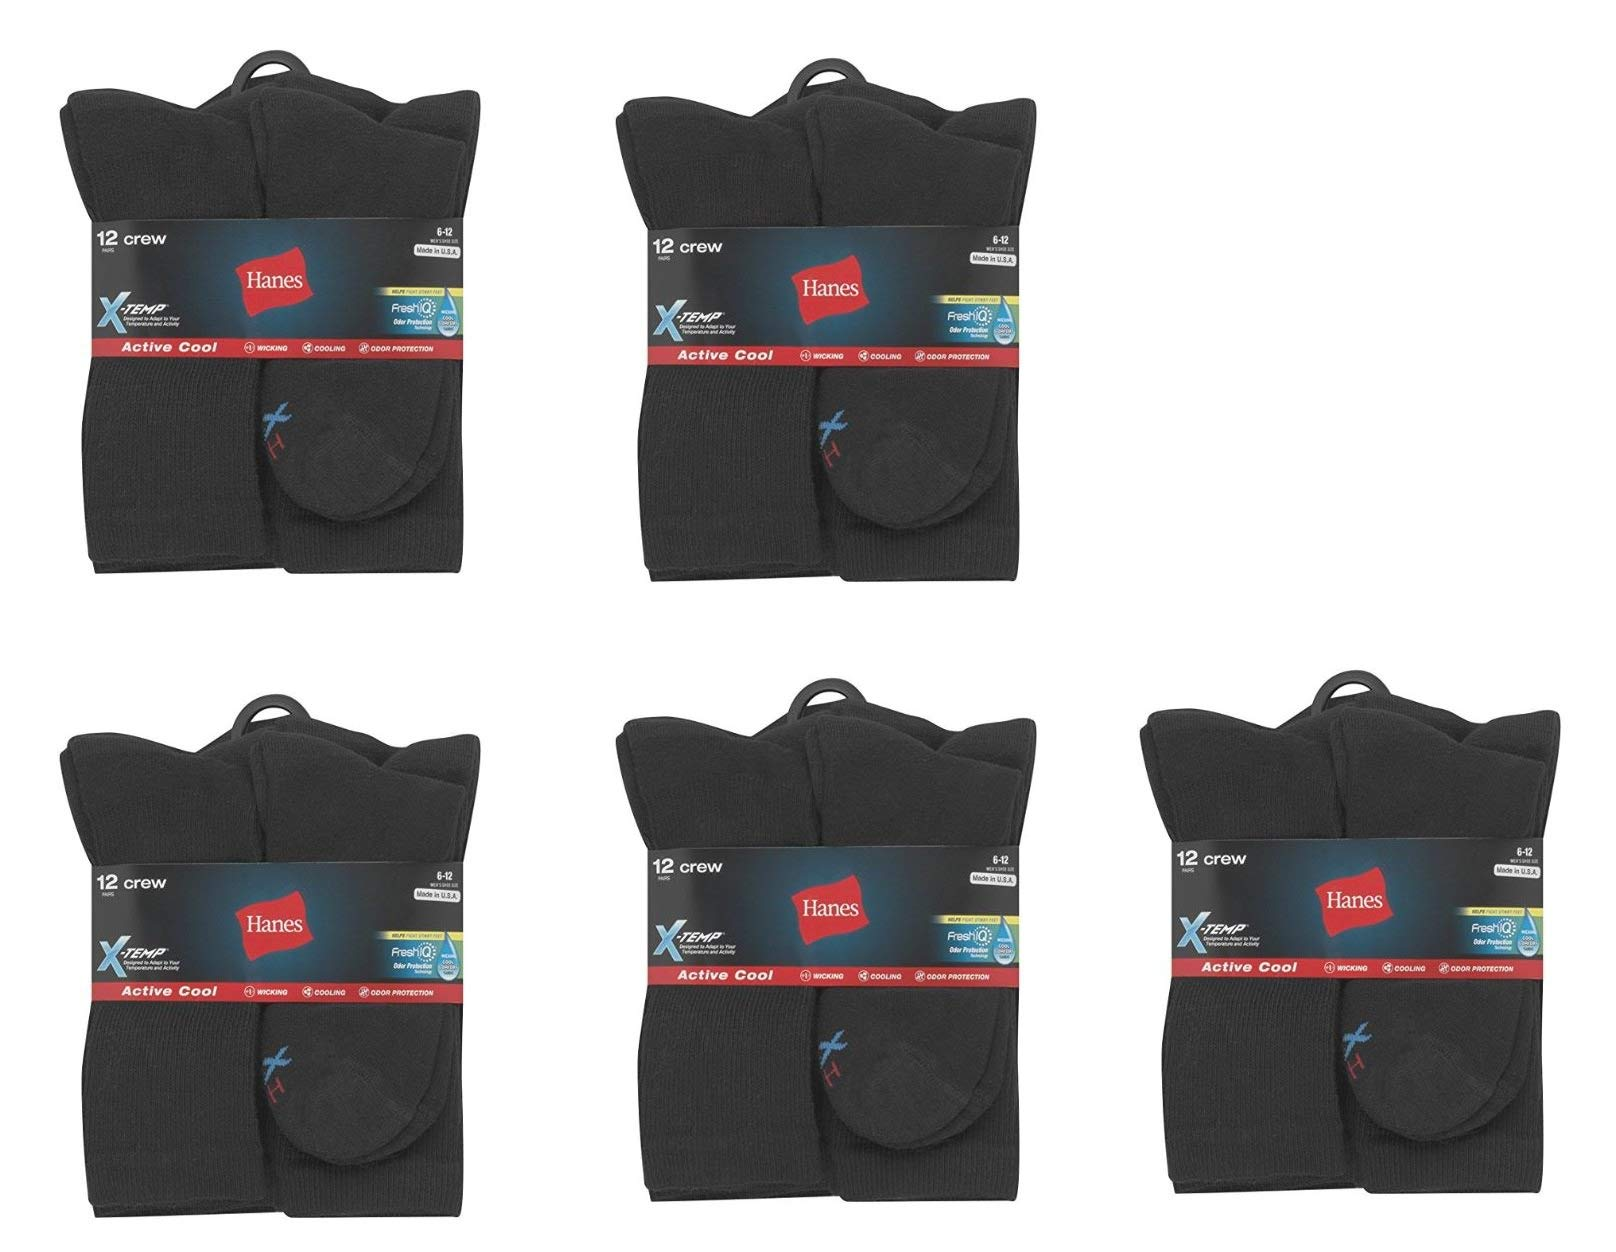 Mens Active Cool Crew Socks, Black, Sock Size 10-13 Shoe Size 6-12, 60 Pack